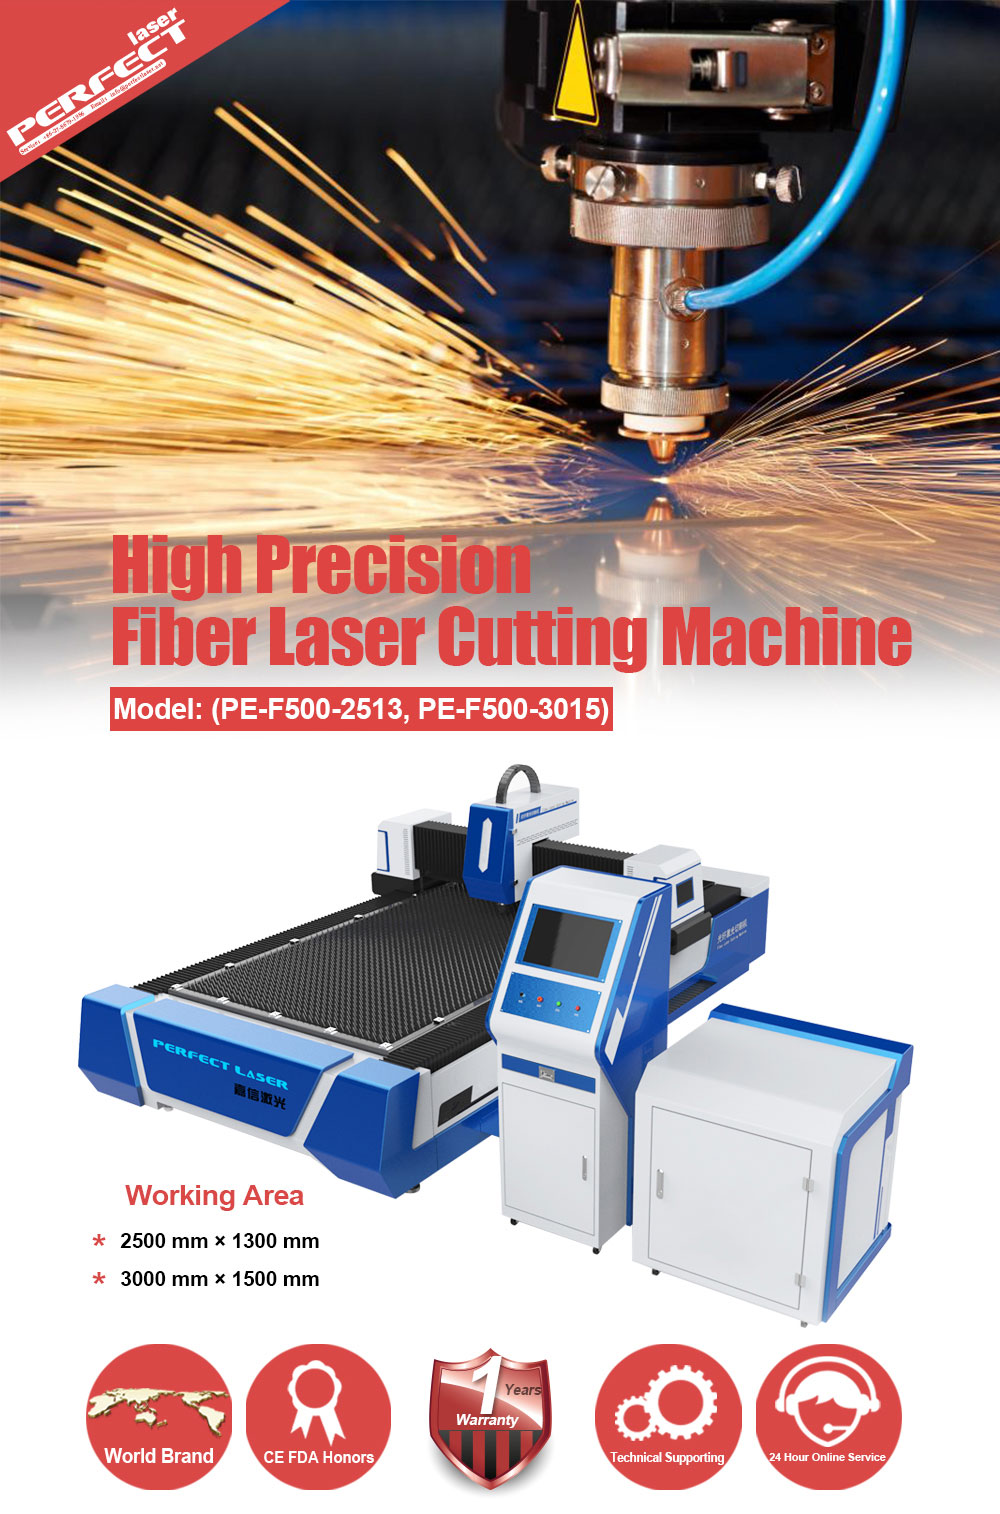 01 Perfect Laser-Fiber Laser Cutting Machine.jpg